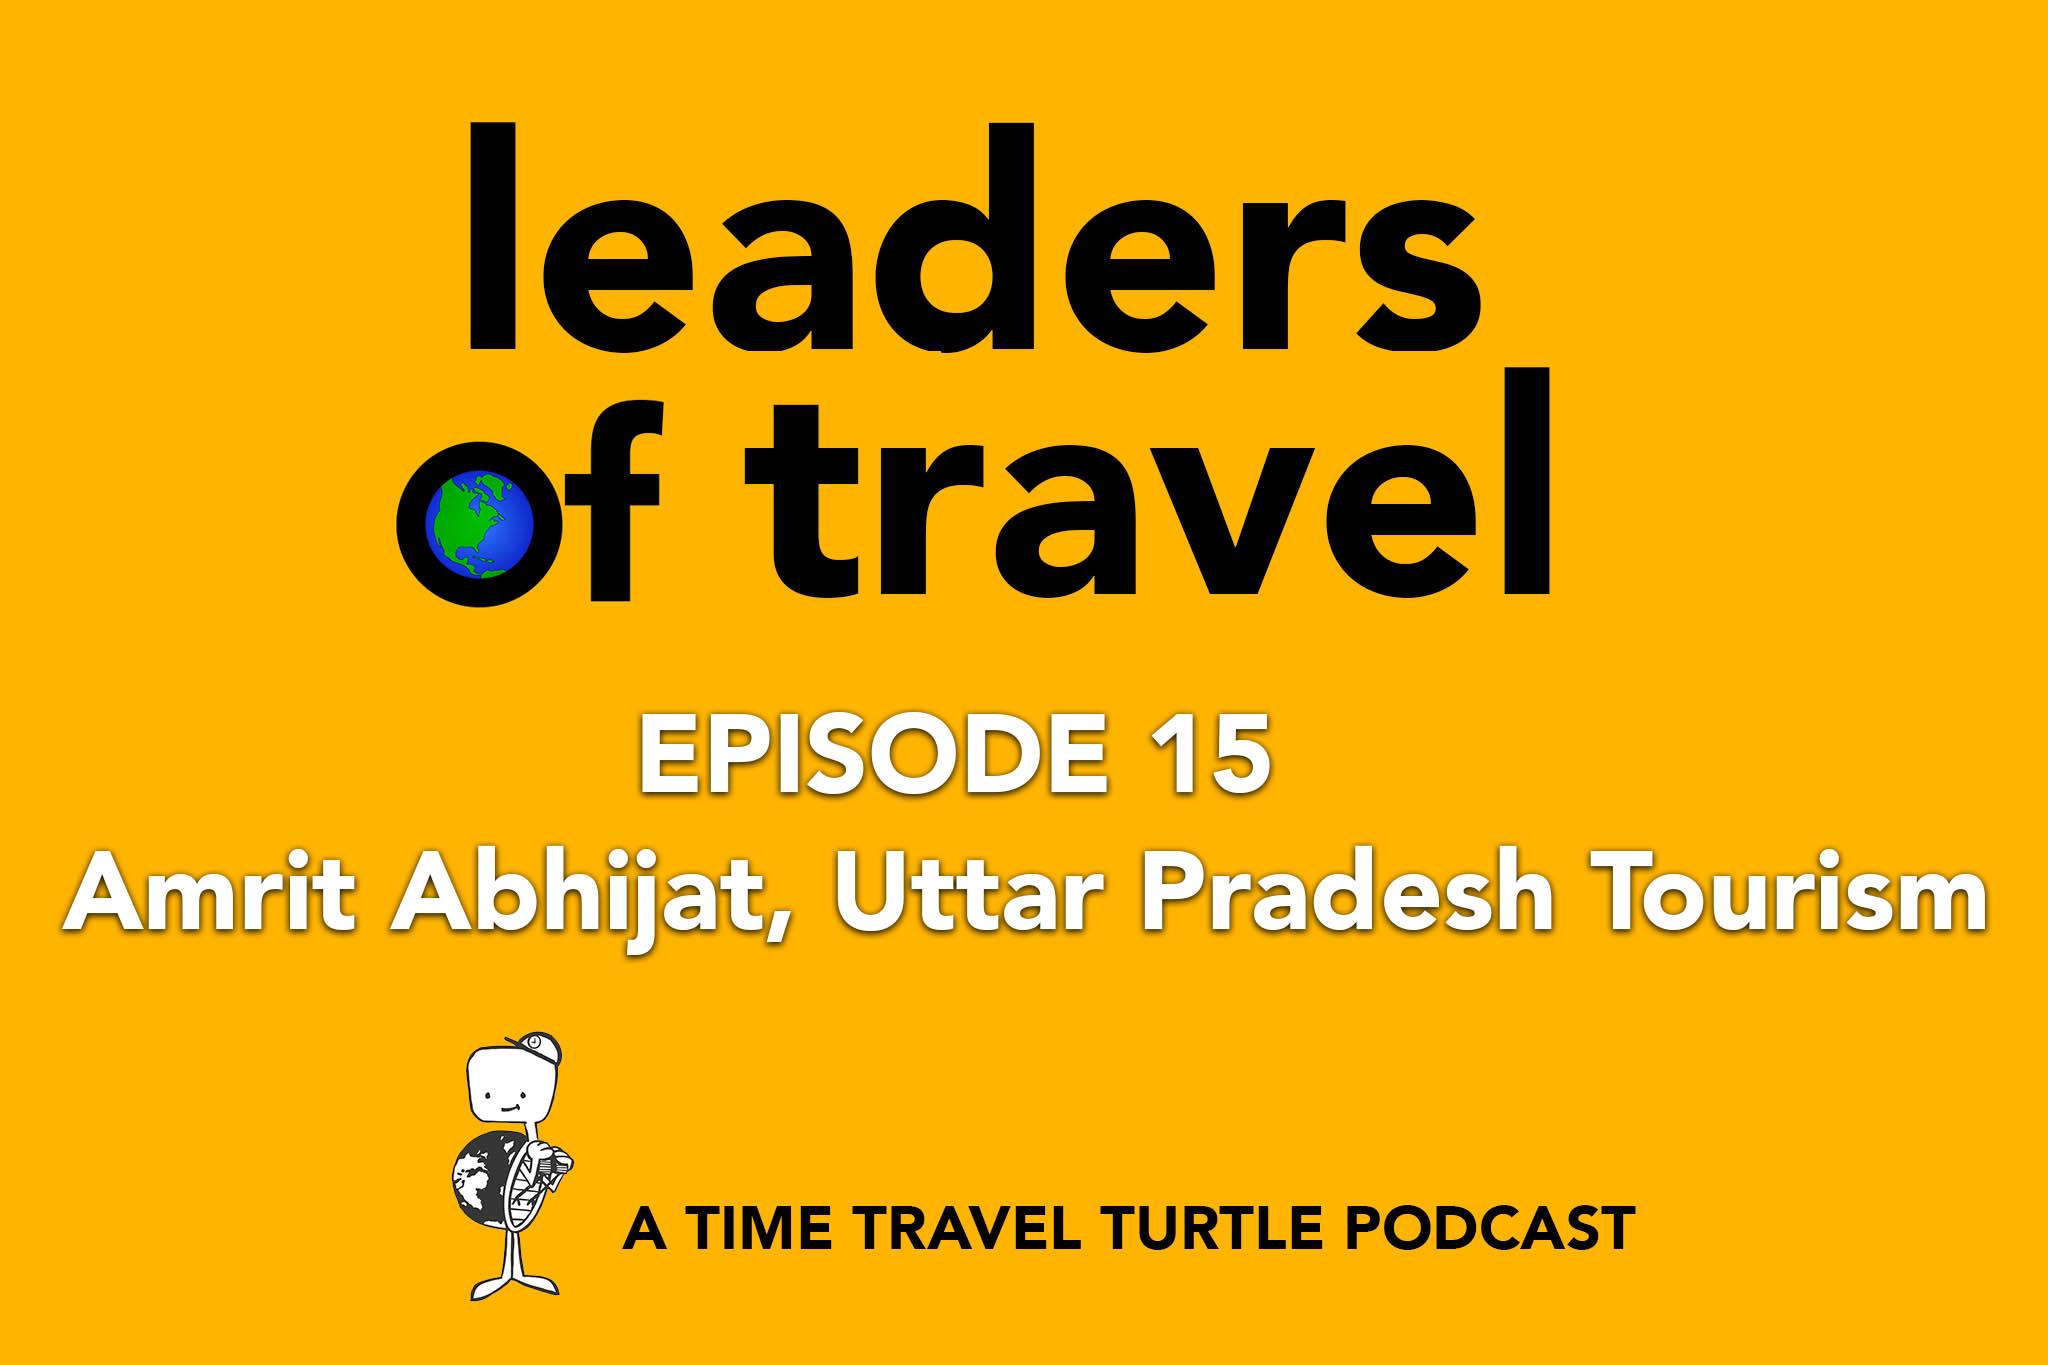 Amrit Abhijat, Uttar Pradesh